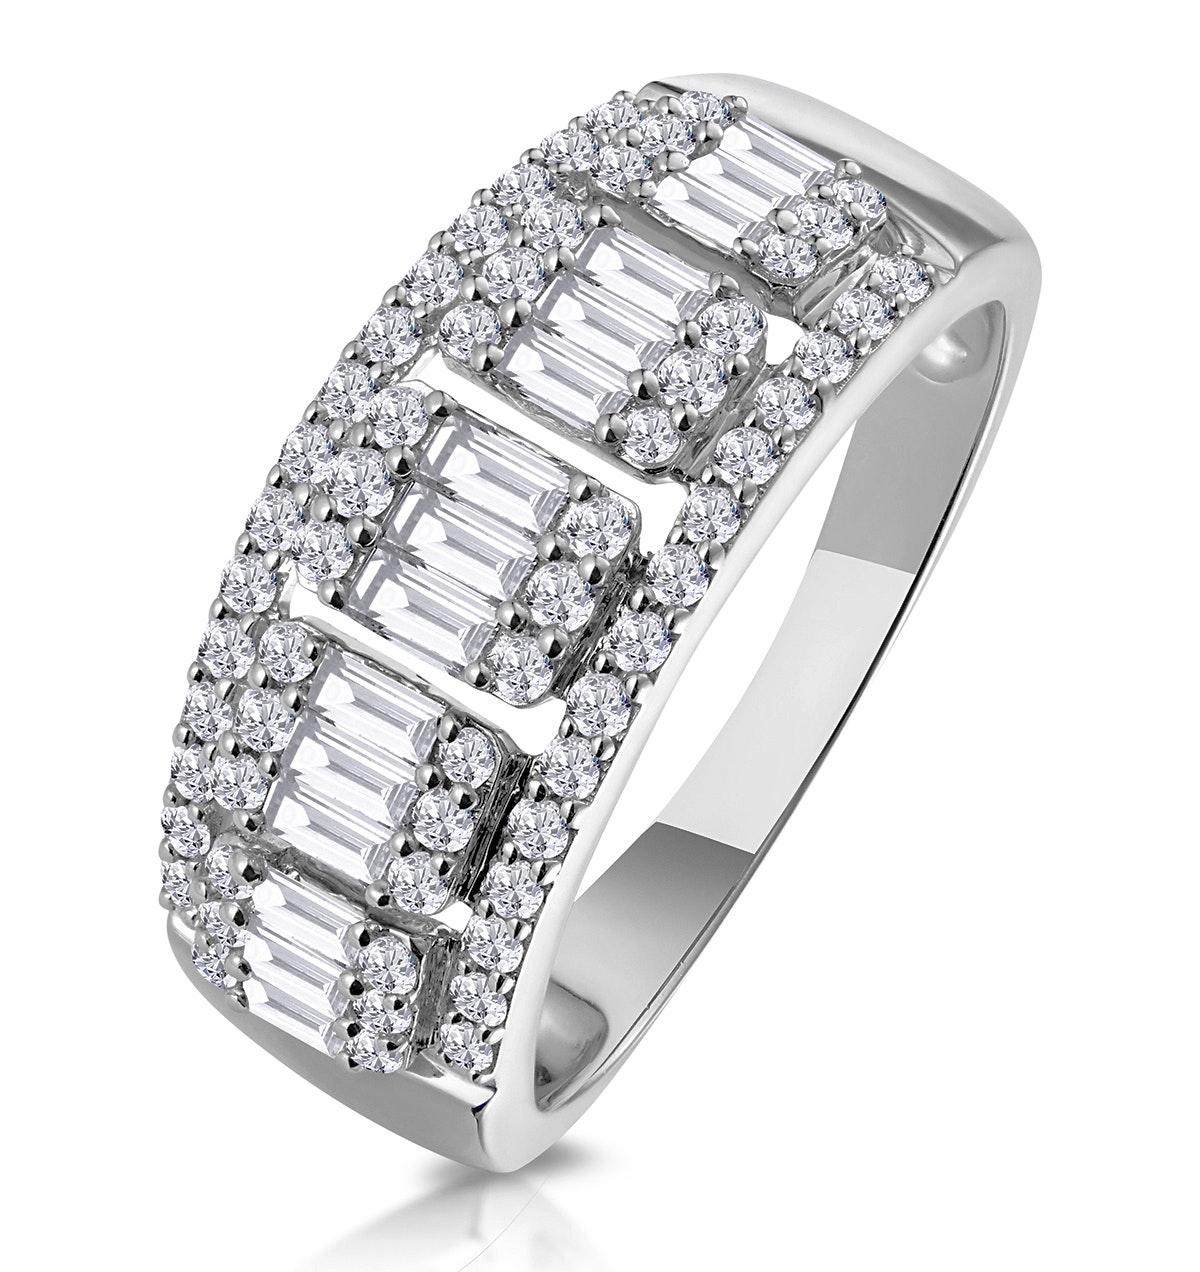 0.85ct Diamond Asteria Baguette Eternity Ring in 18K White Gold